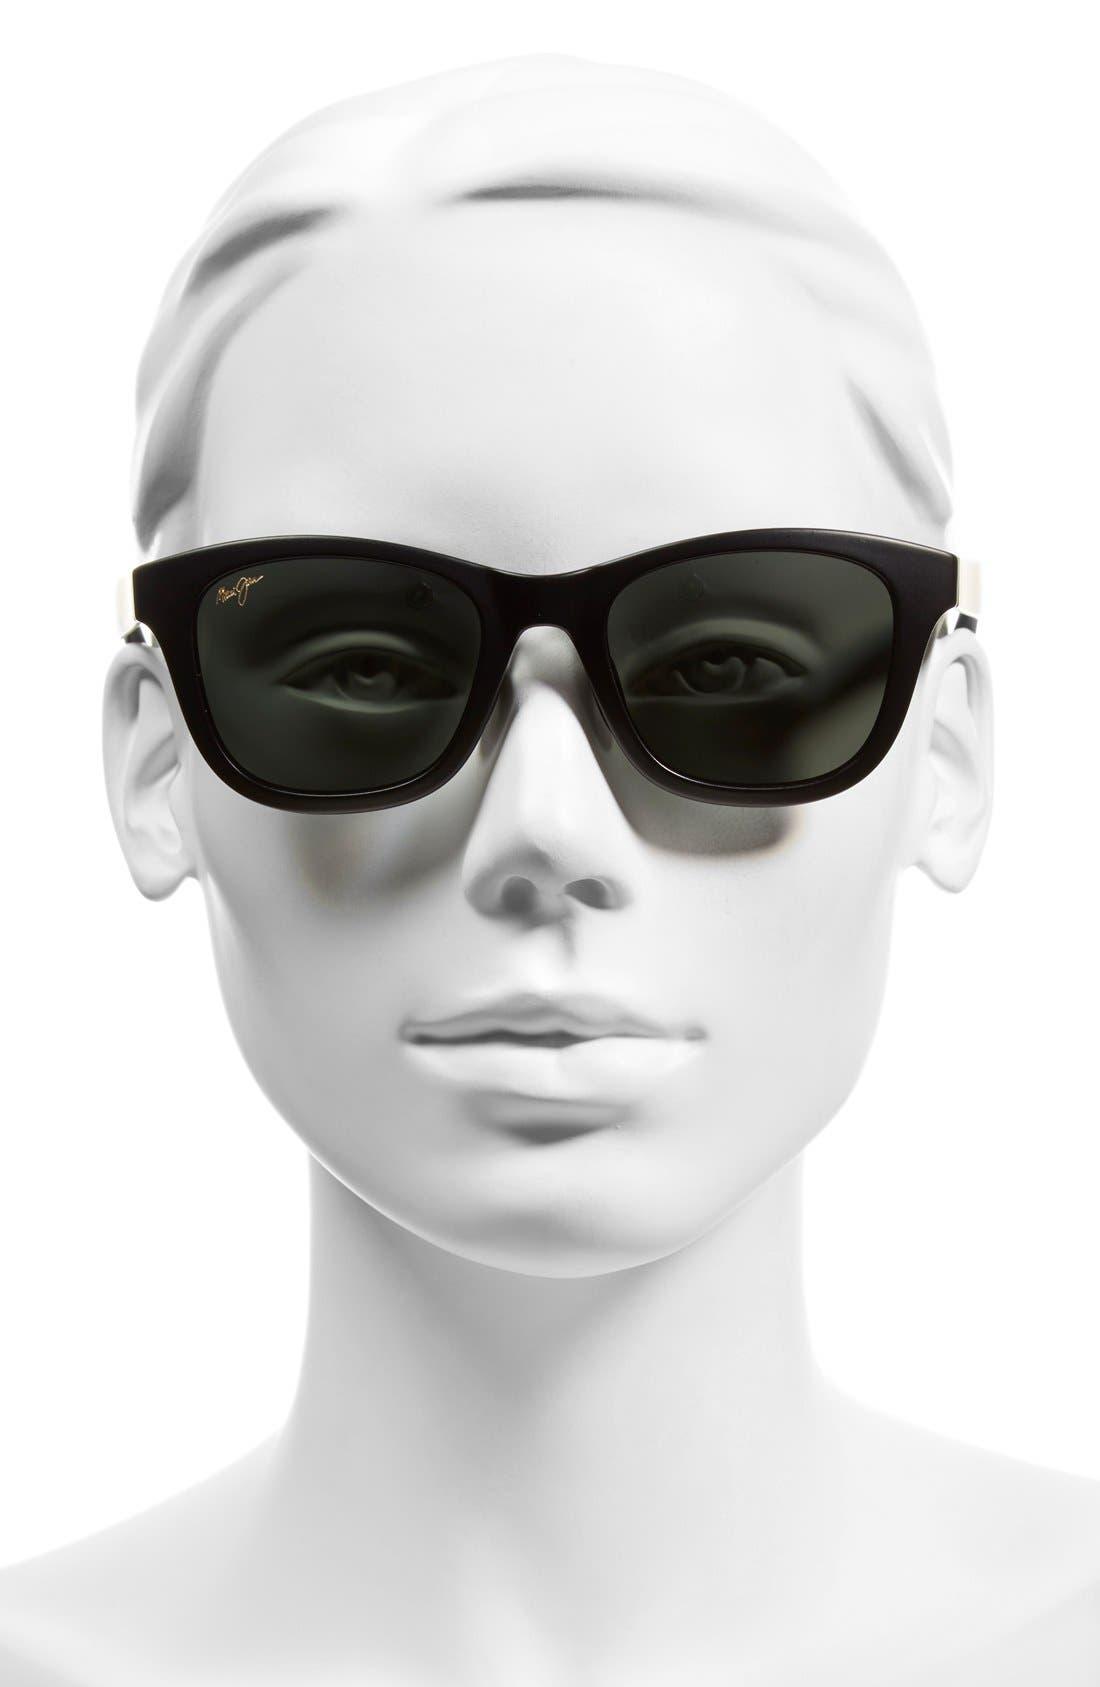 Hana Bay 51mm PolarizedPlus2<sup>®</sup> Sunglasses,                             Alternate thumbnail 4, color,                             MATTE BLACK/ NEUTRAL GREY